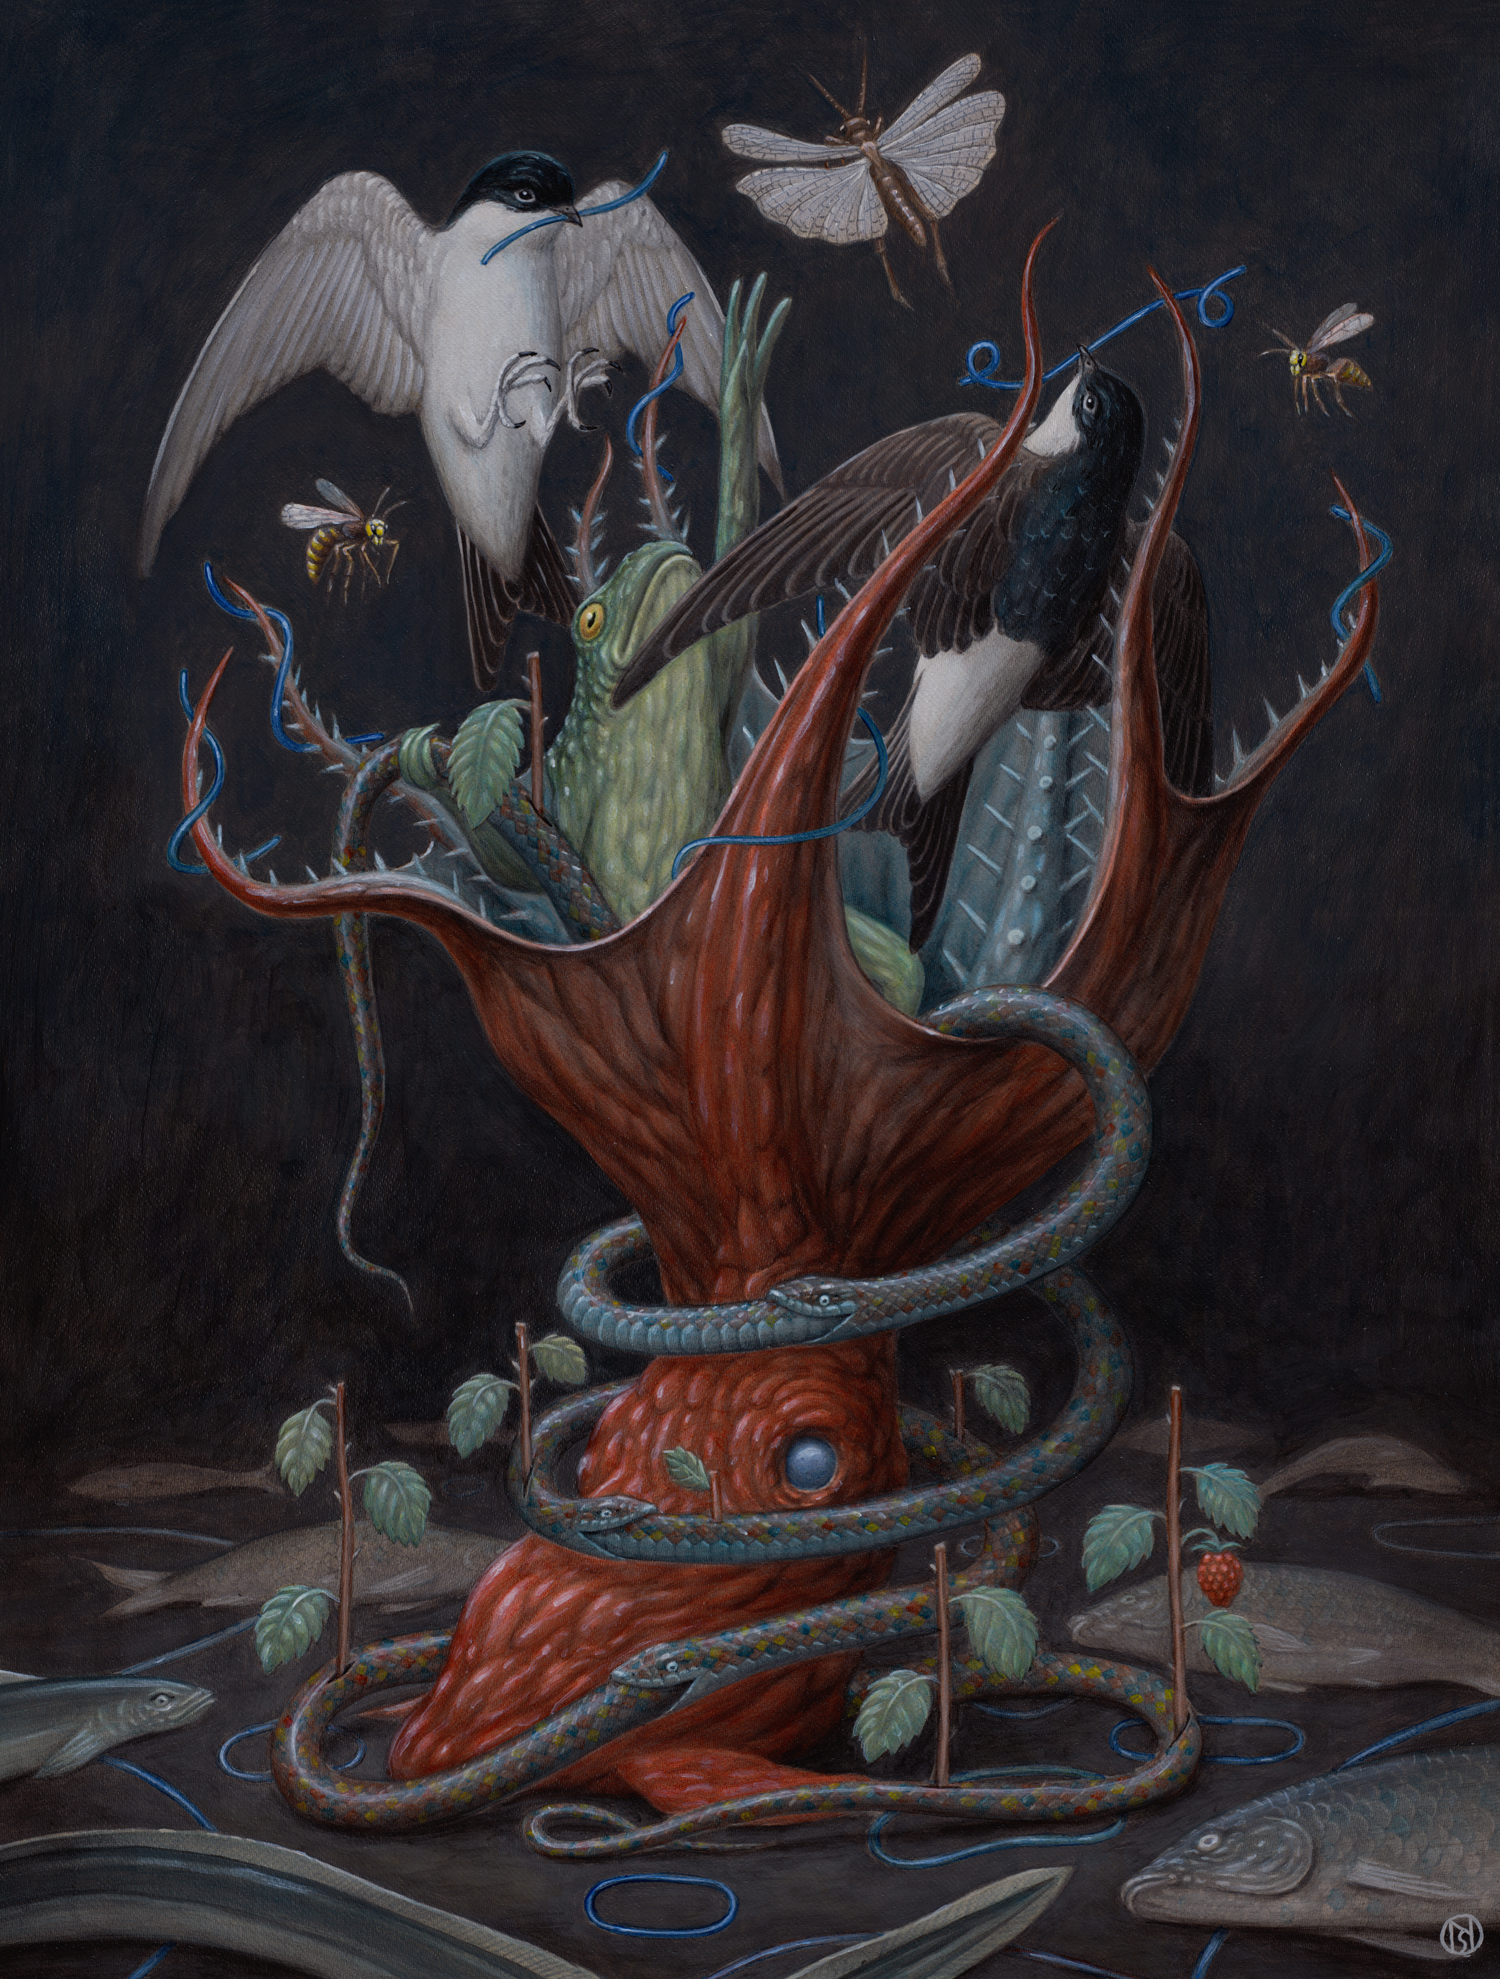 The-Vampire-Tree-By-Nick-Sheehy.jpg